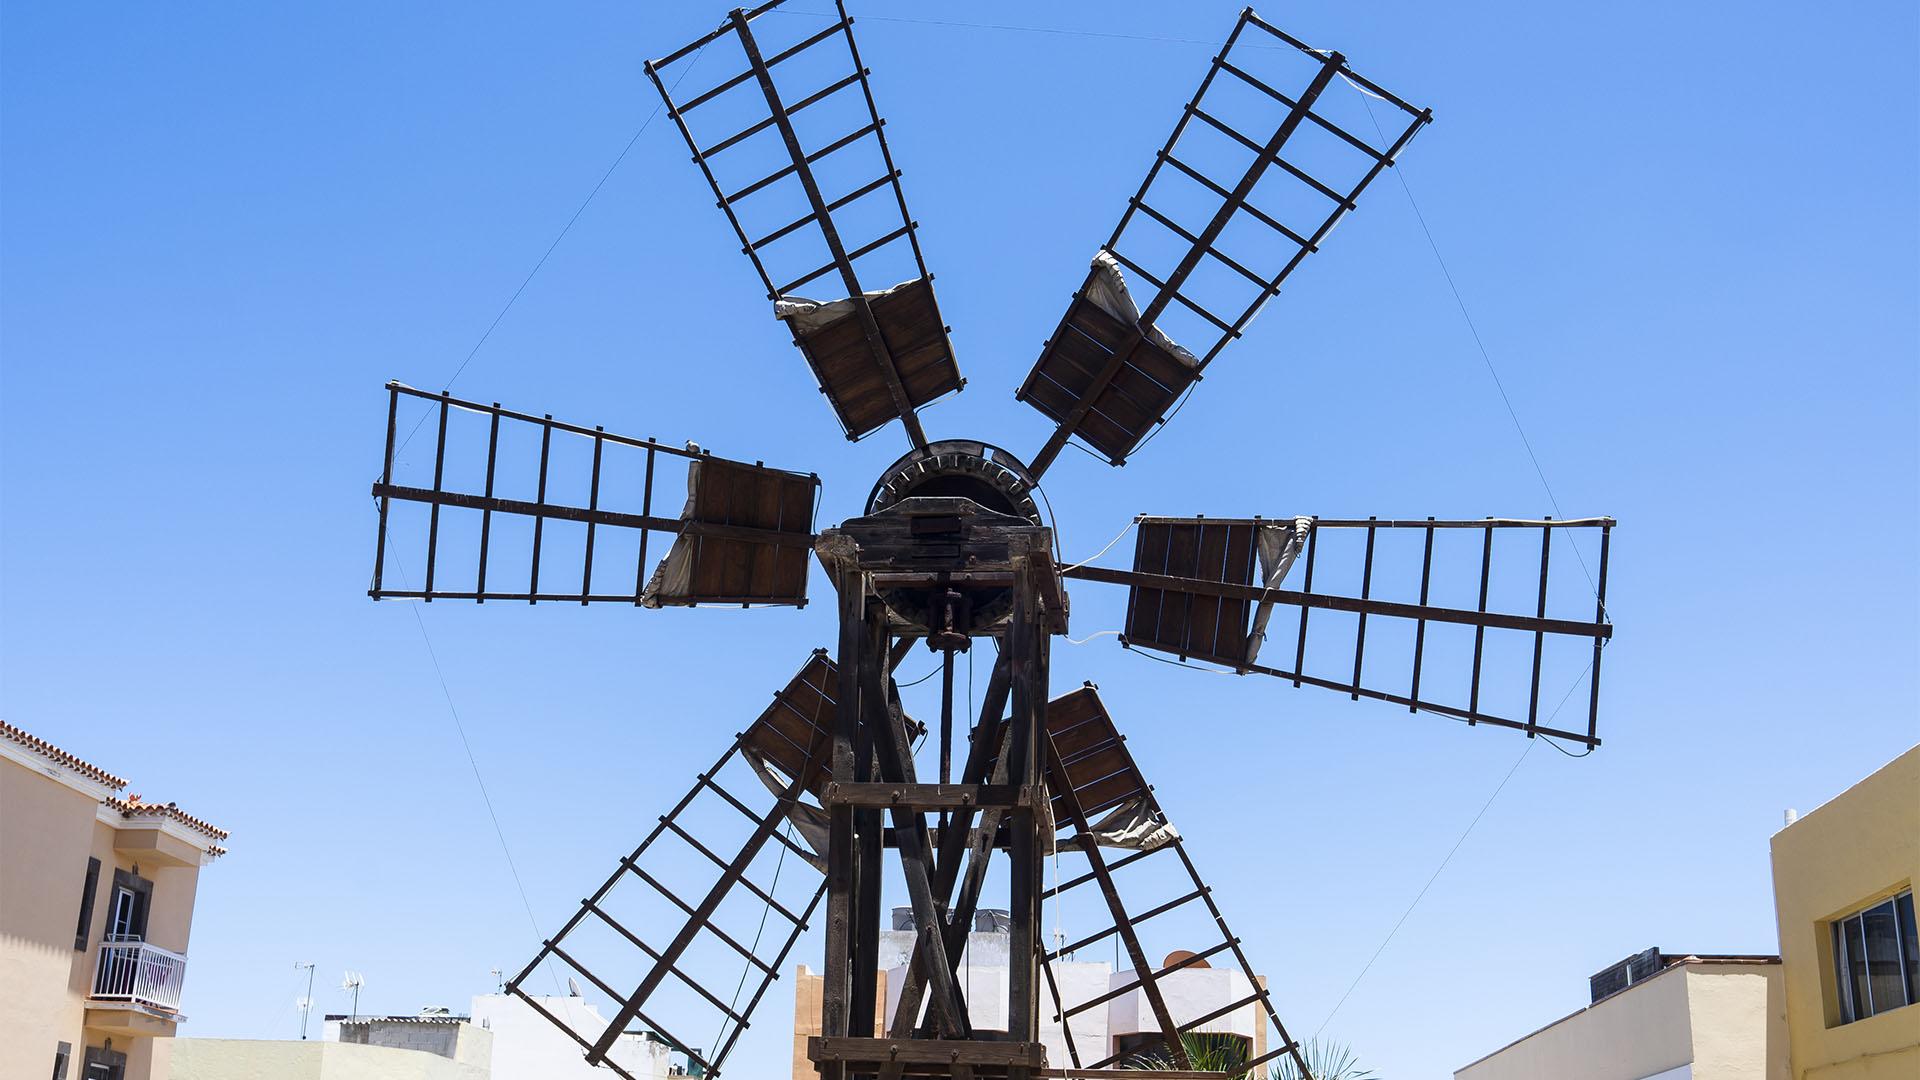 Die Windmühlen von Corralejo Fuerteventura: Molina de Manolo Hierro